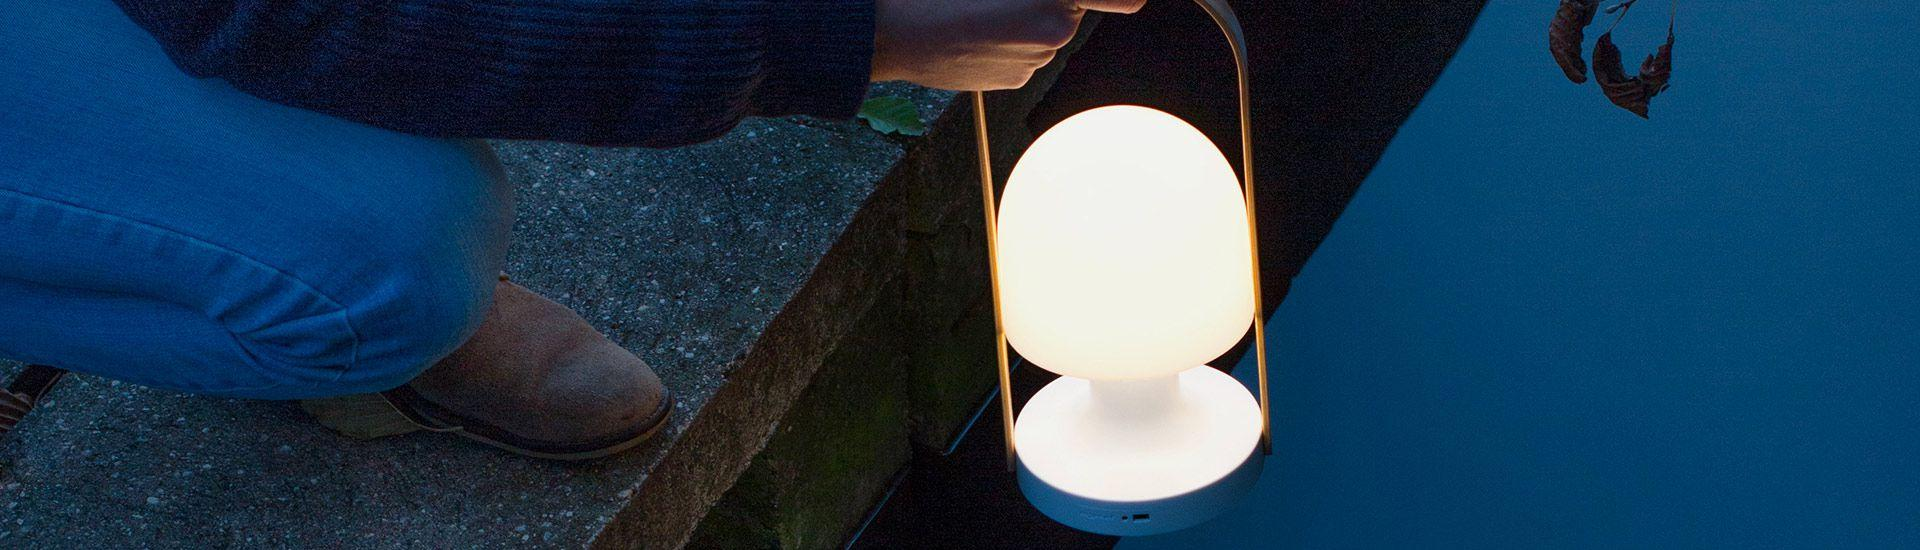 Follow Me Lámpara portatil LED 3,2W 2700K 240lm Blanco